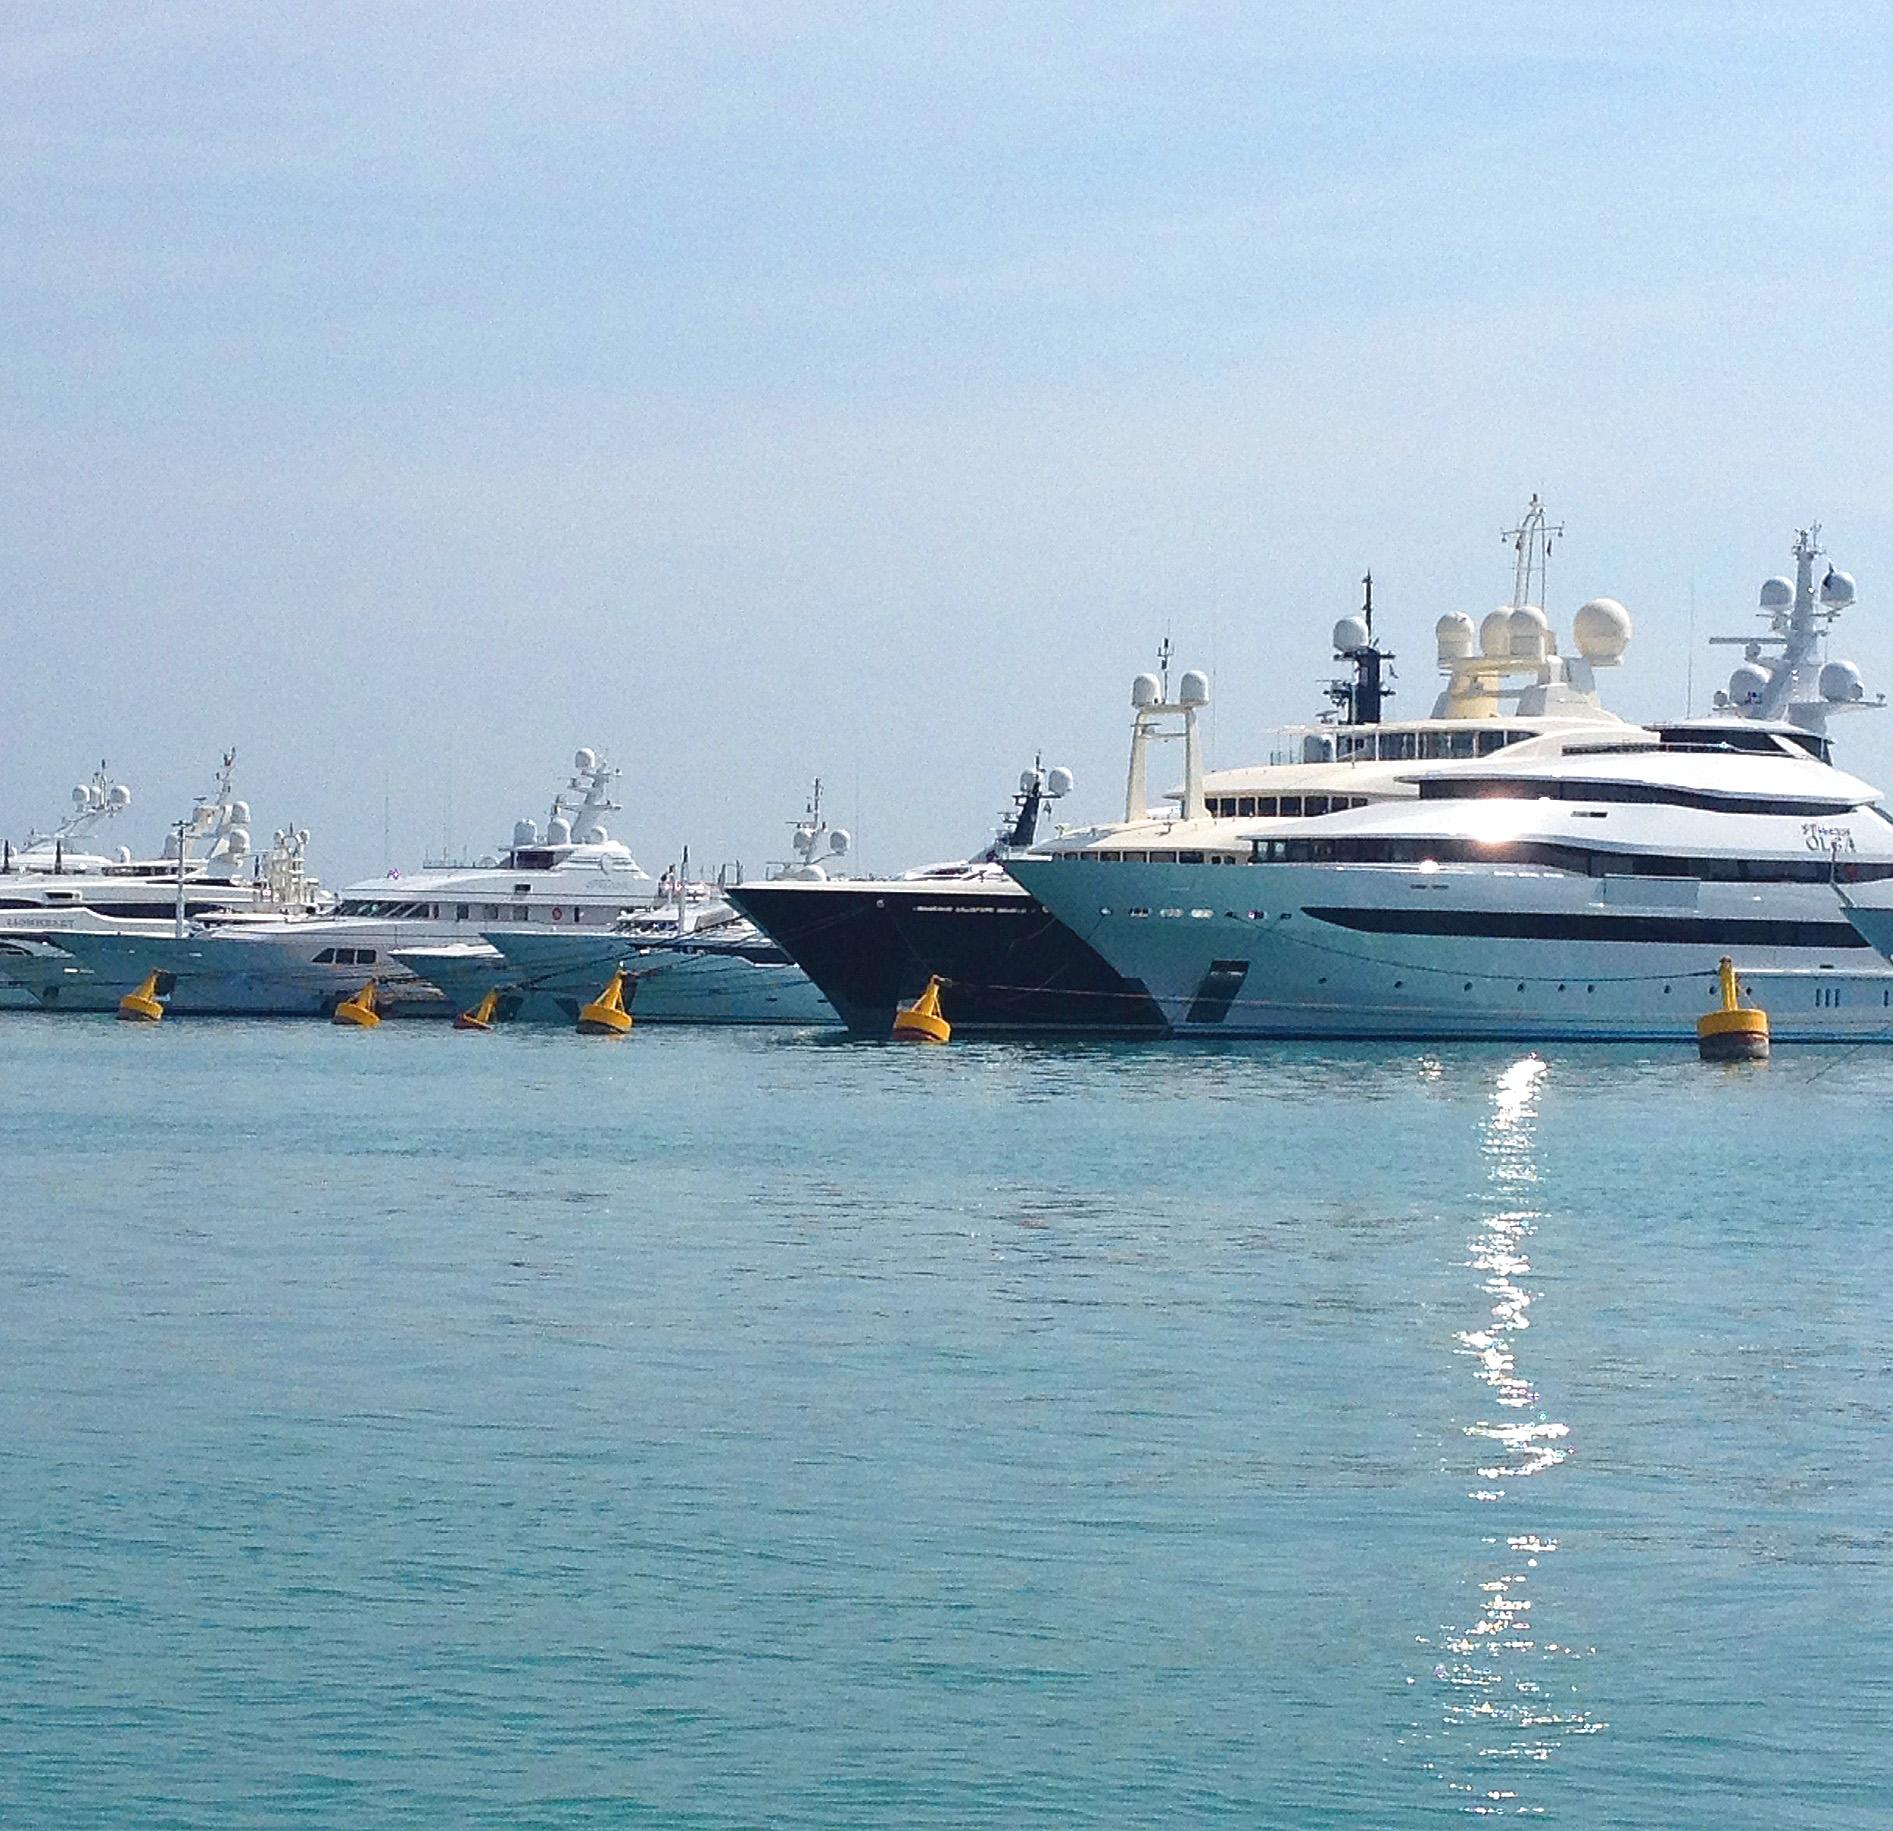 Superyacht berths on Berth For Yacht